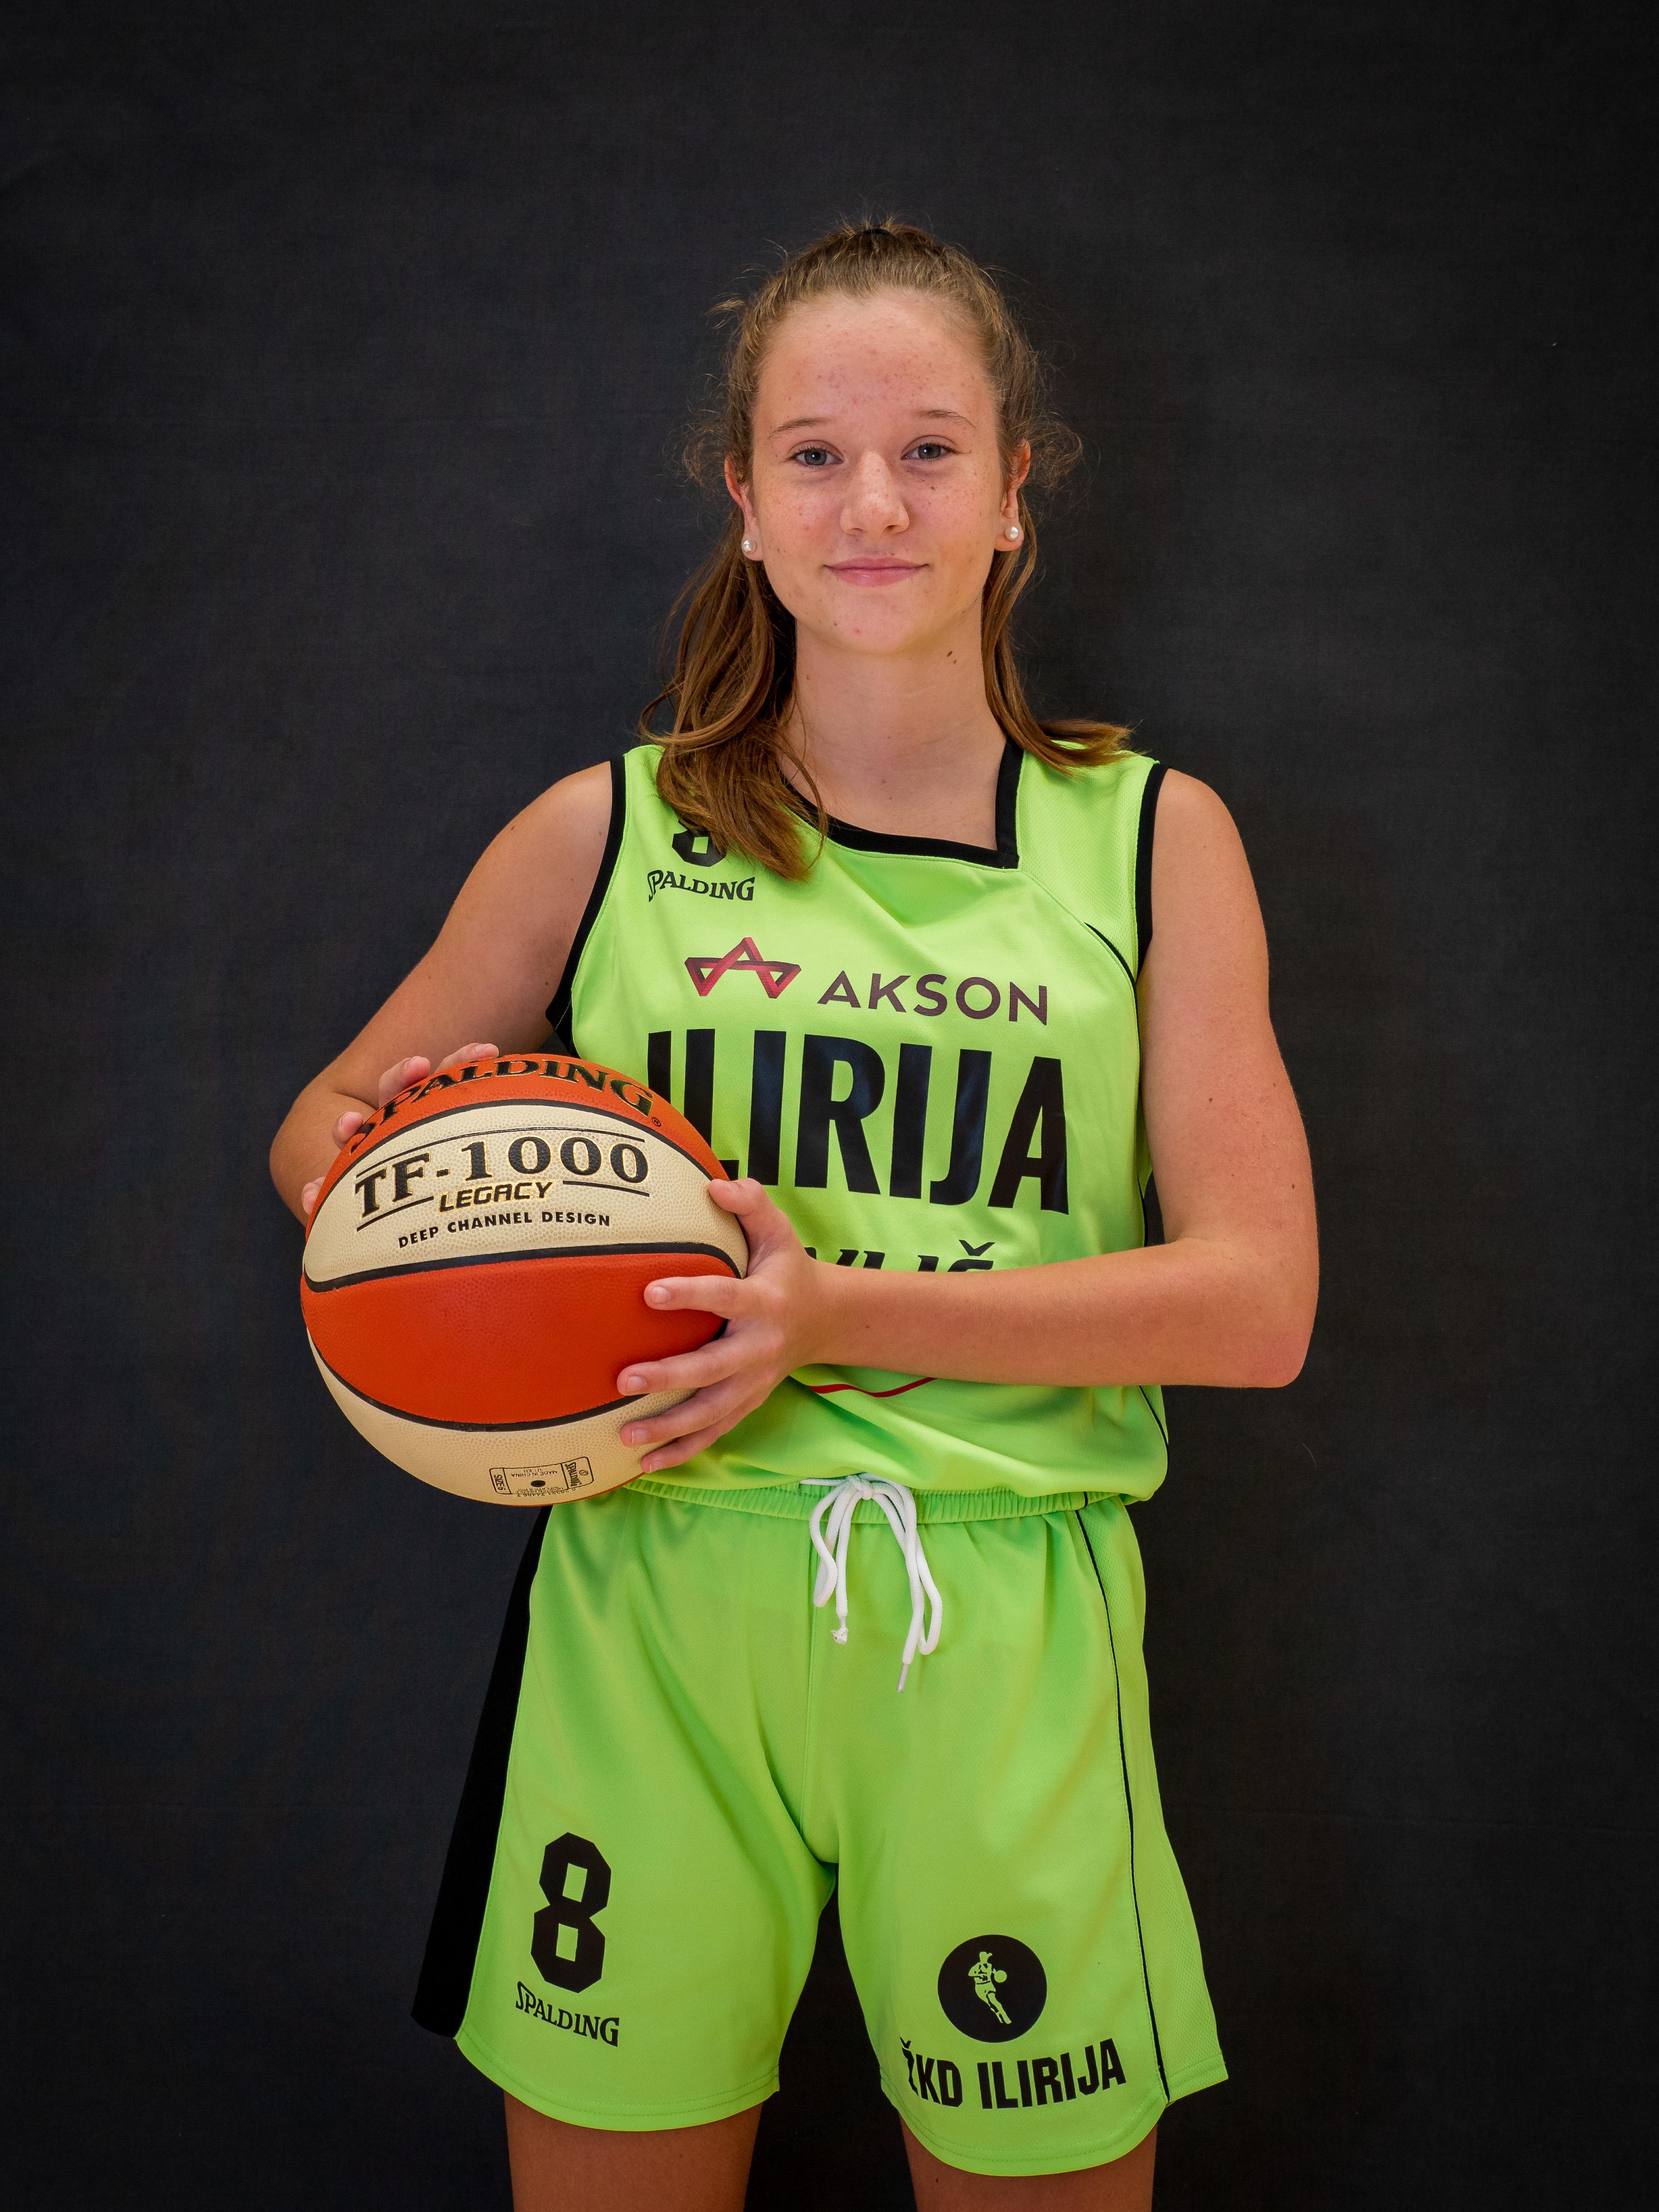 Anja Mustavar